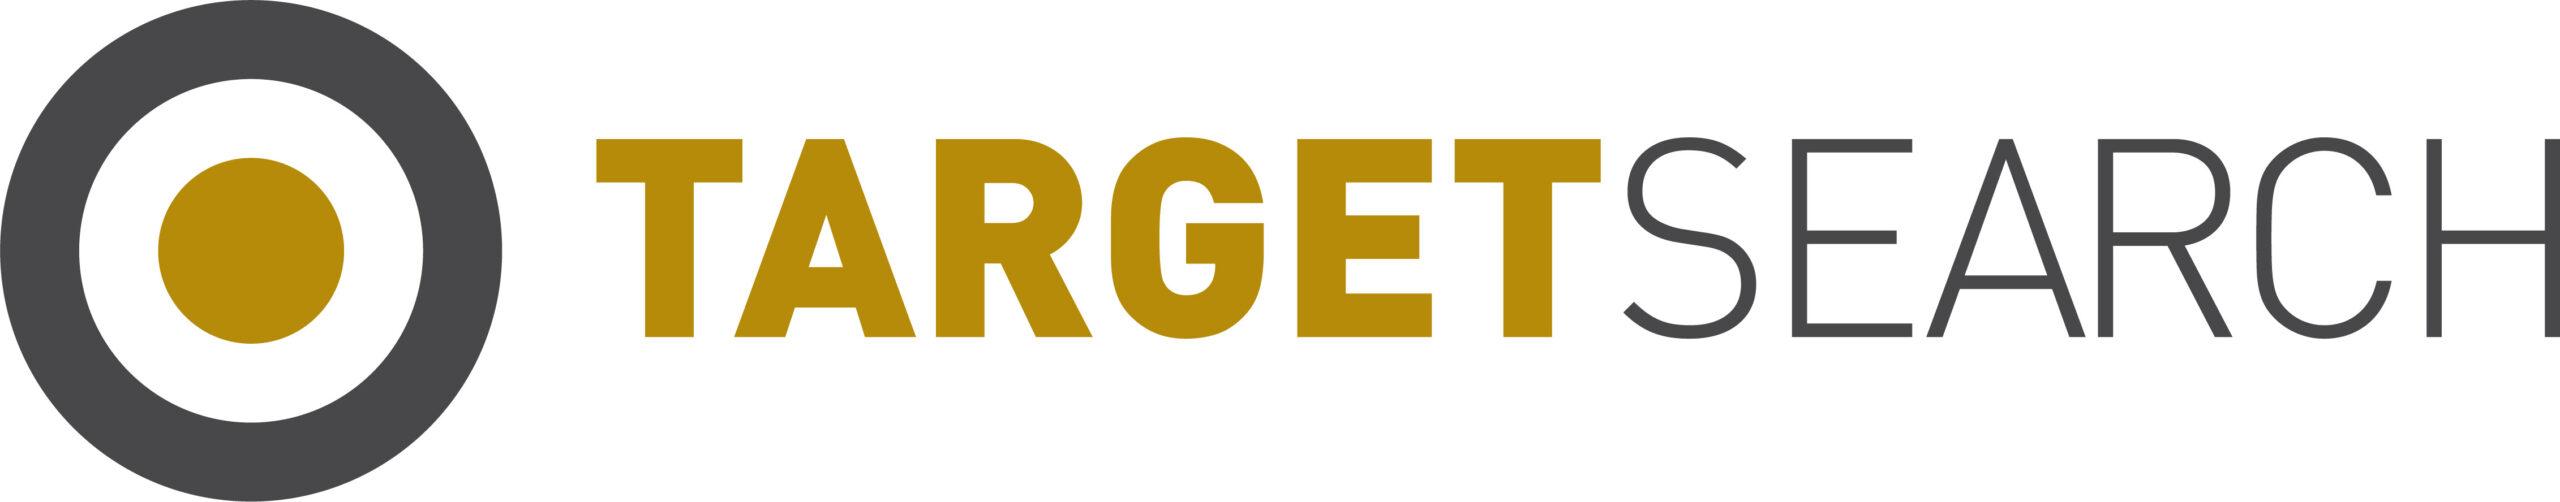 targetsearch-logo